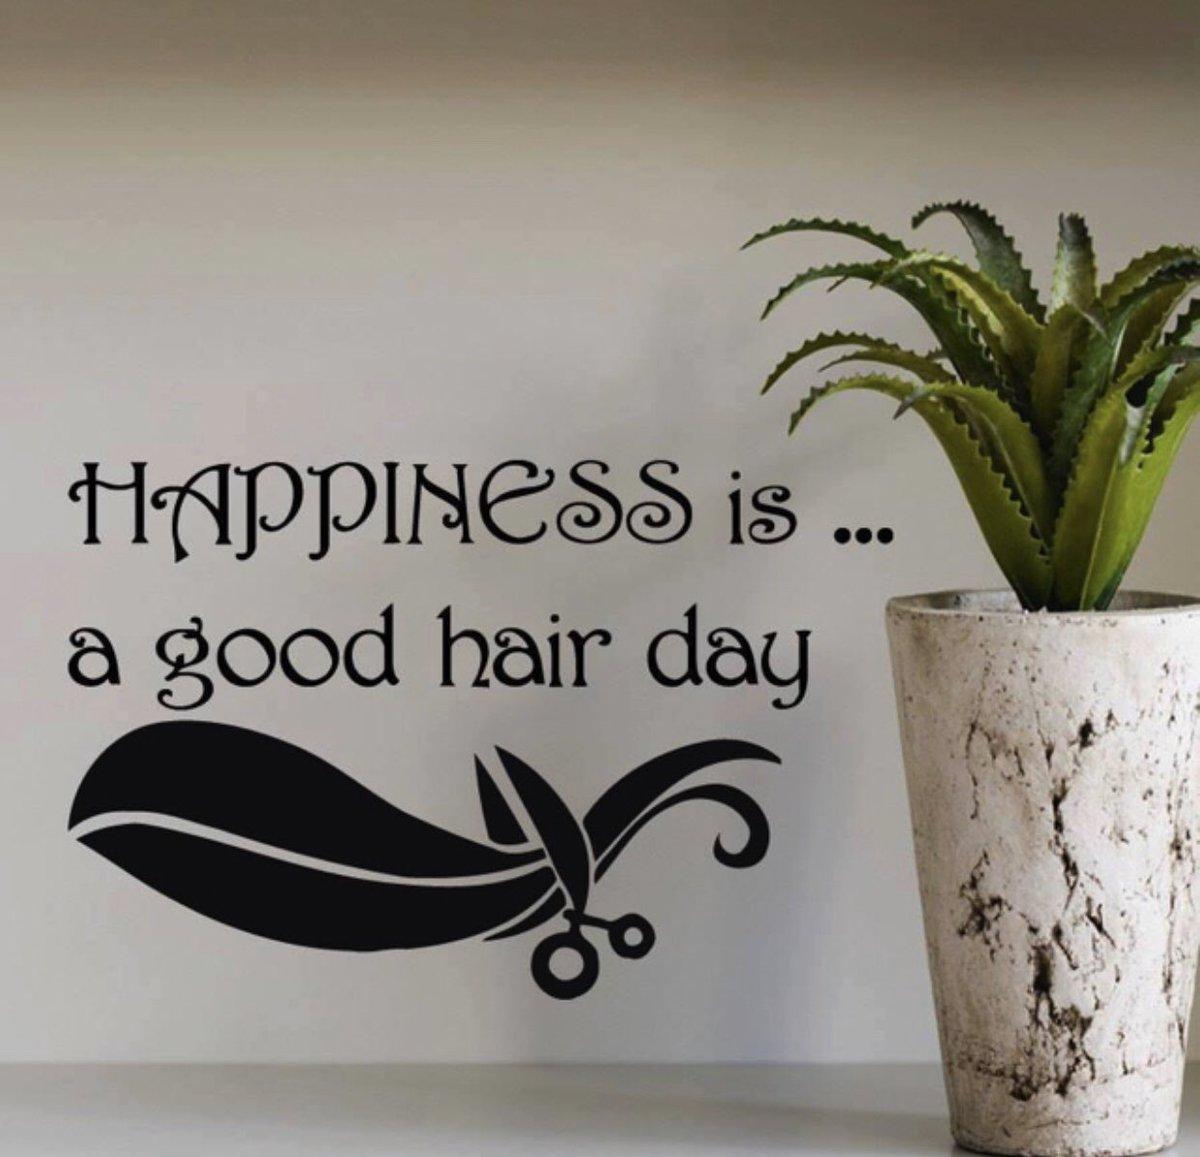 YES It is!!  406-272-0070 BOOK Online 24/7https://go.booker.com/Studio406salon #Hair #Salon #Hairsalon #Billings #MT #406hair #Studio406salon #BillingsHair #HairofBillings #Selfcare #Regram #Beauty #Hairday #Wellnesspic.twitter.com/ObaP5vwyyk